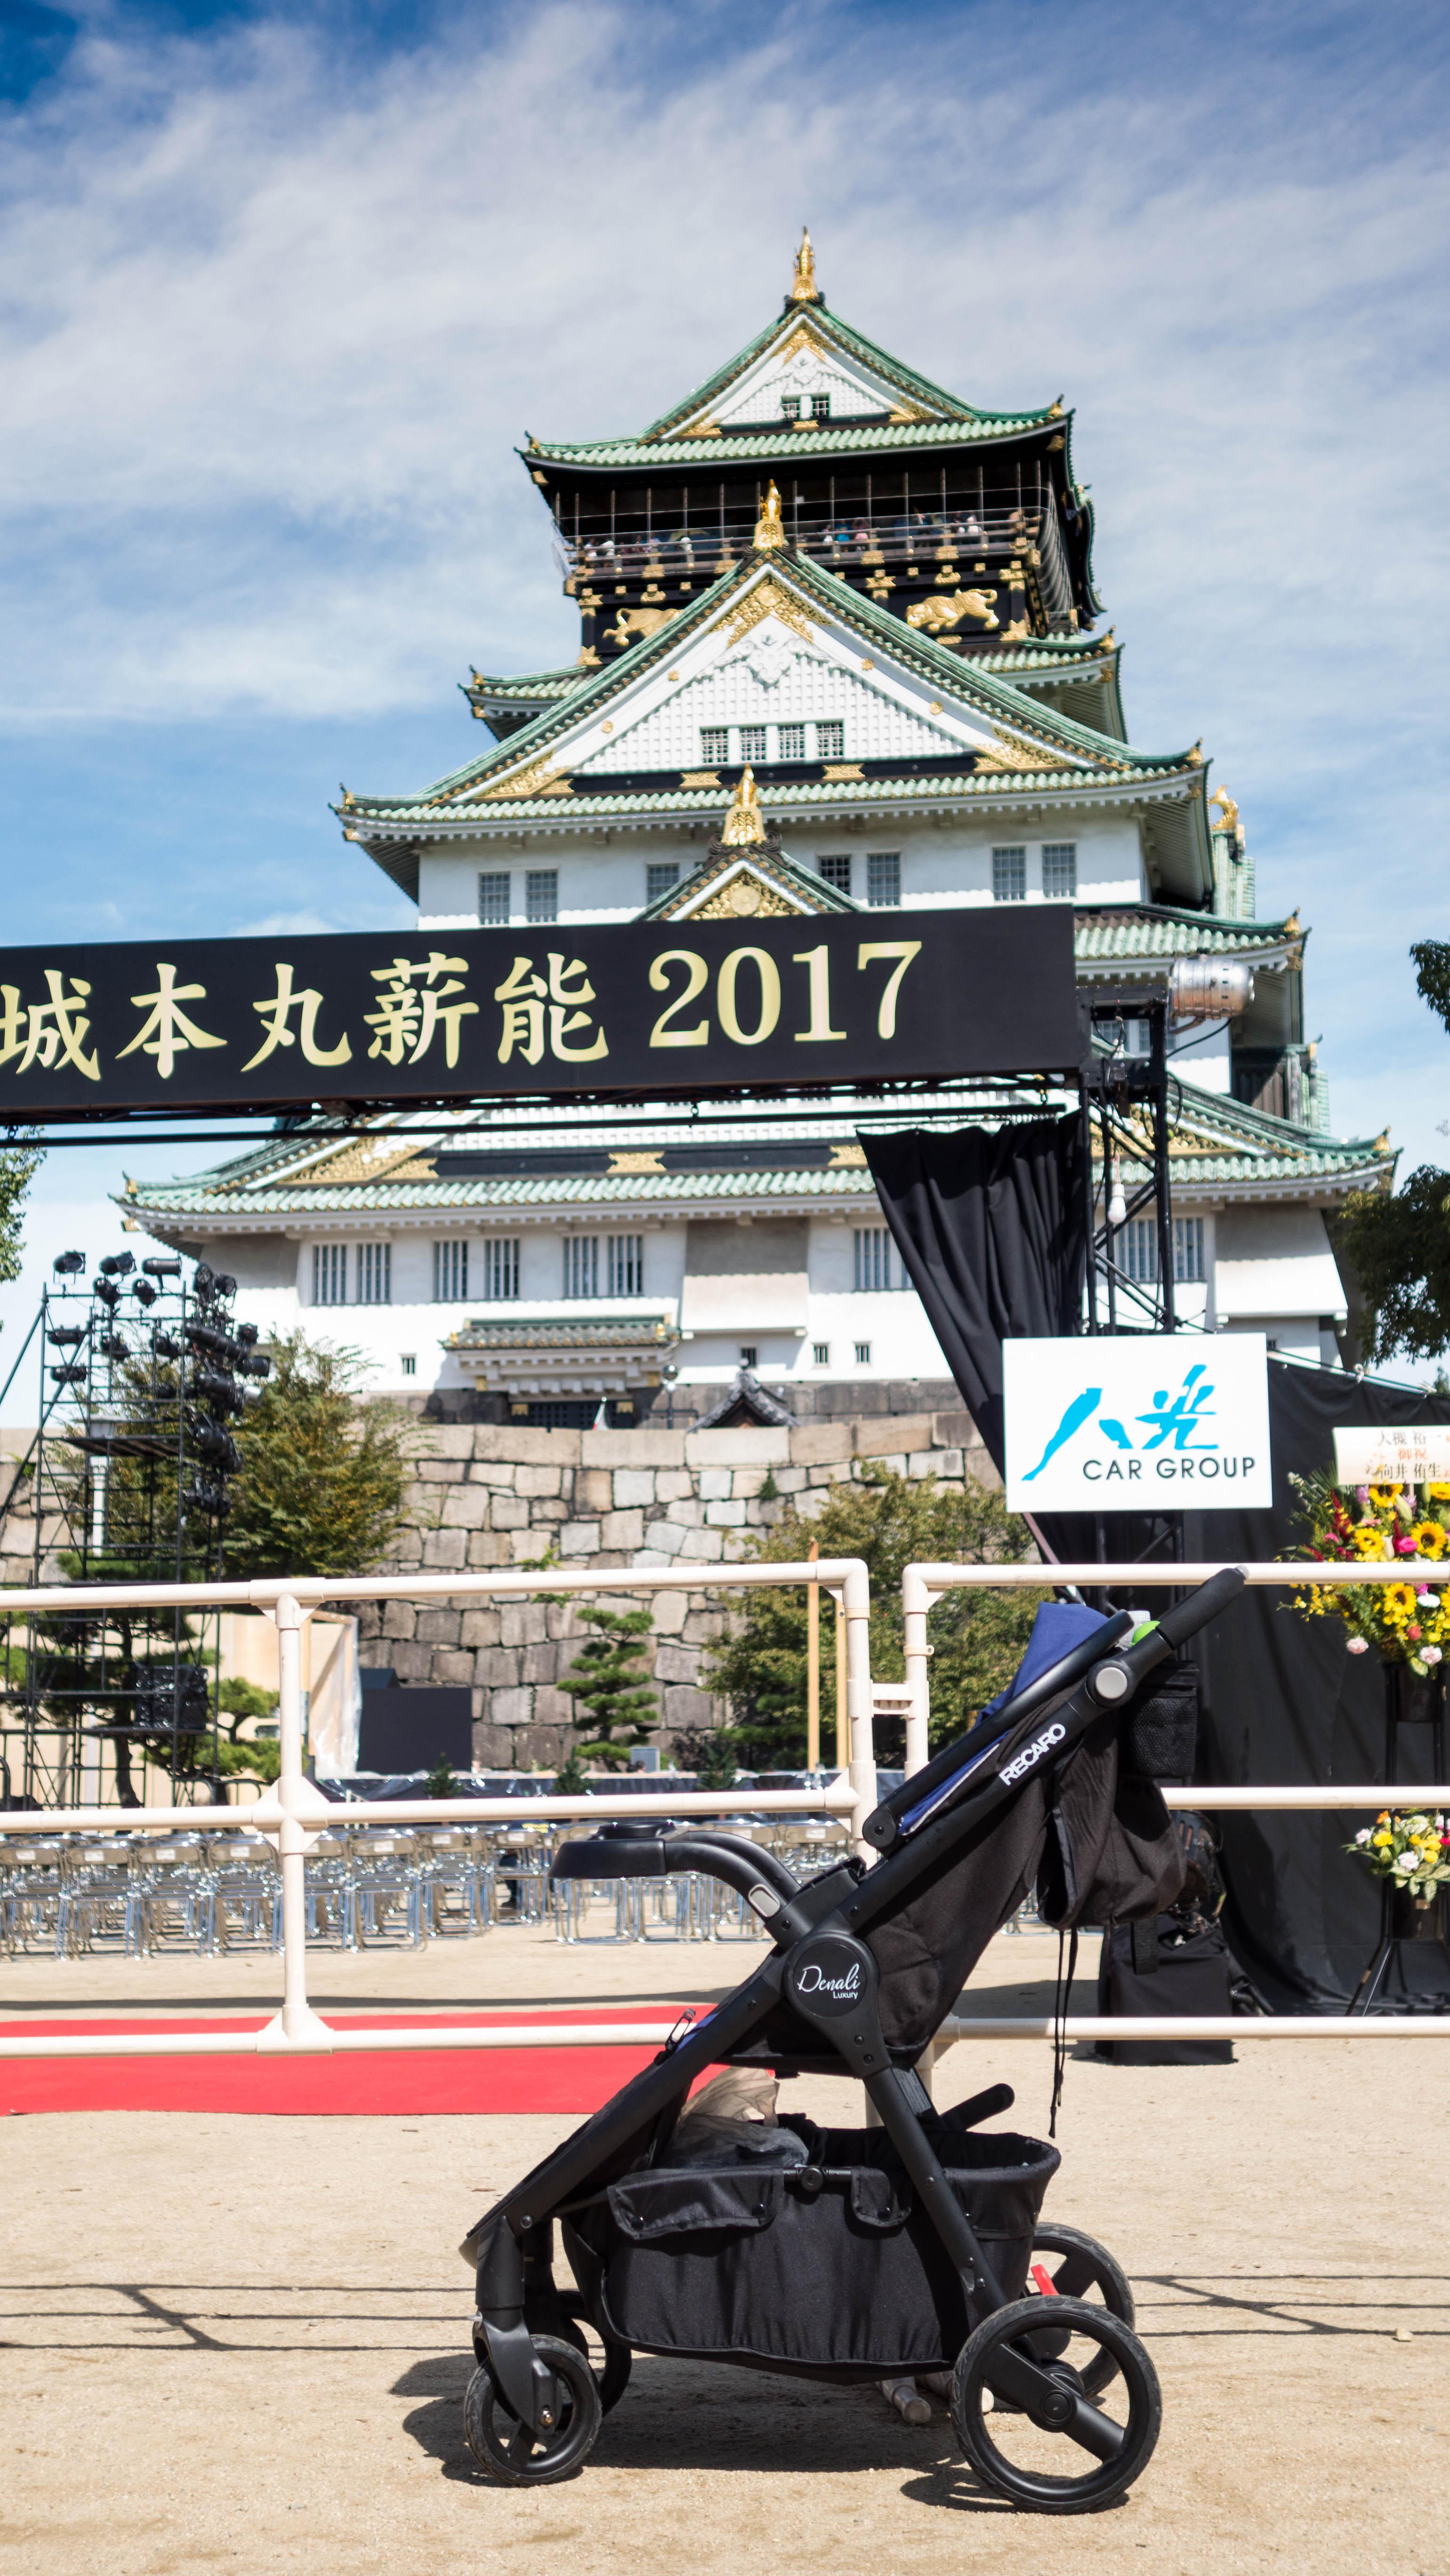 RECARO Performance Denali Luxury Stroller at Osaka Castle